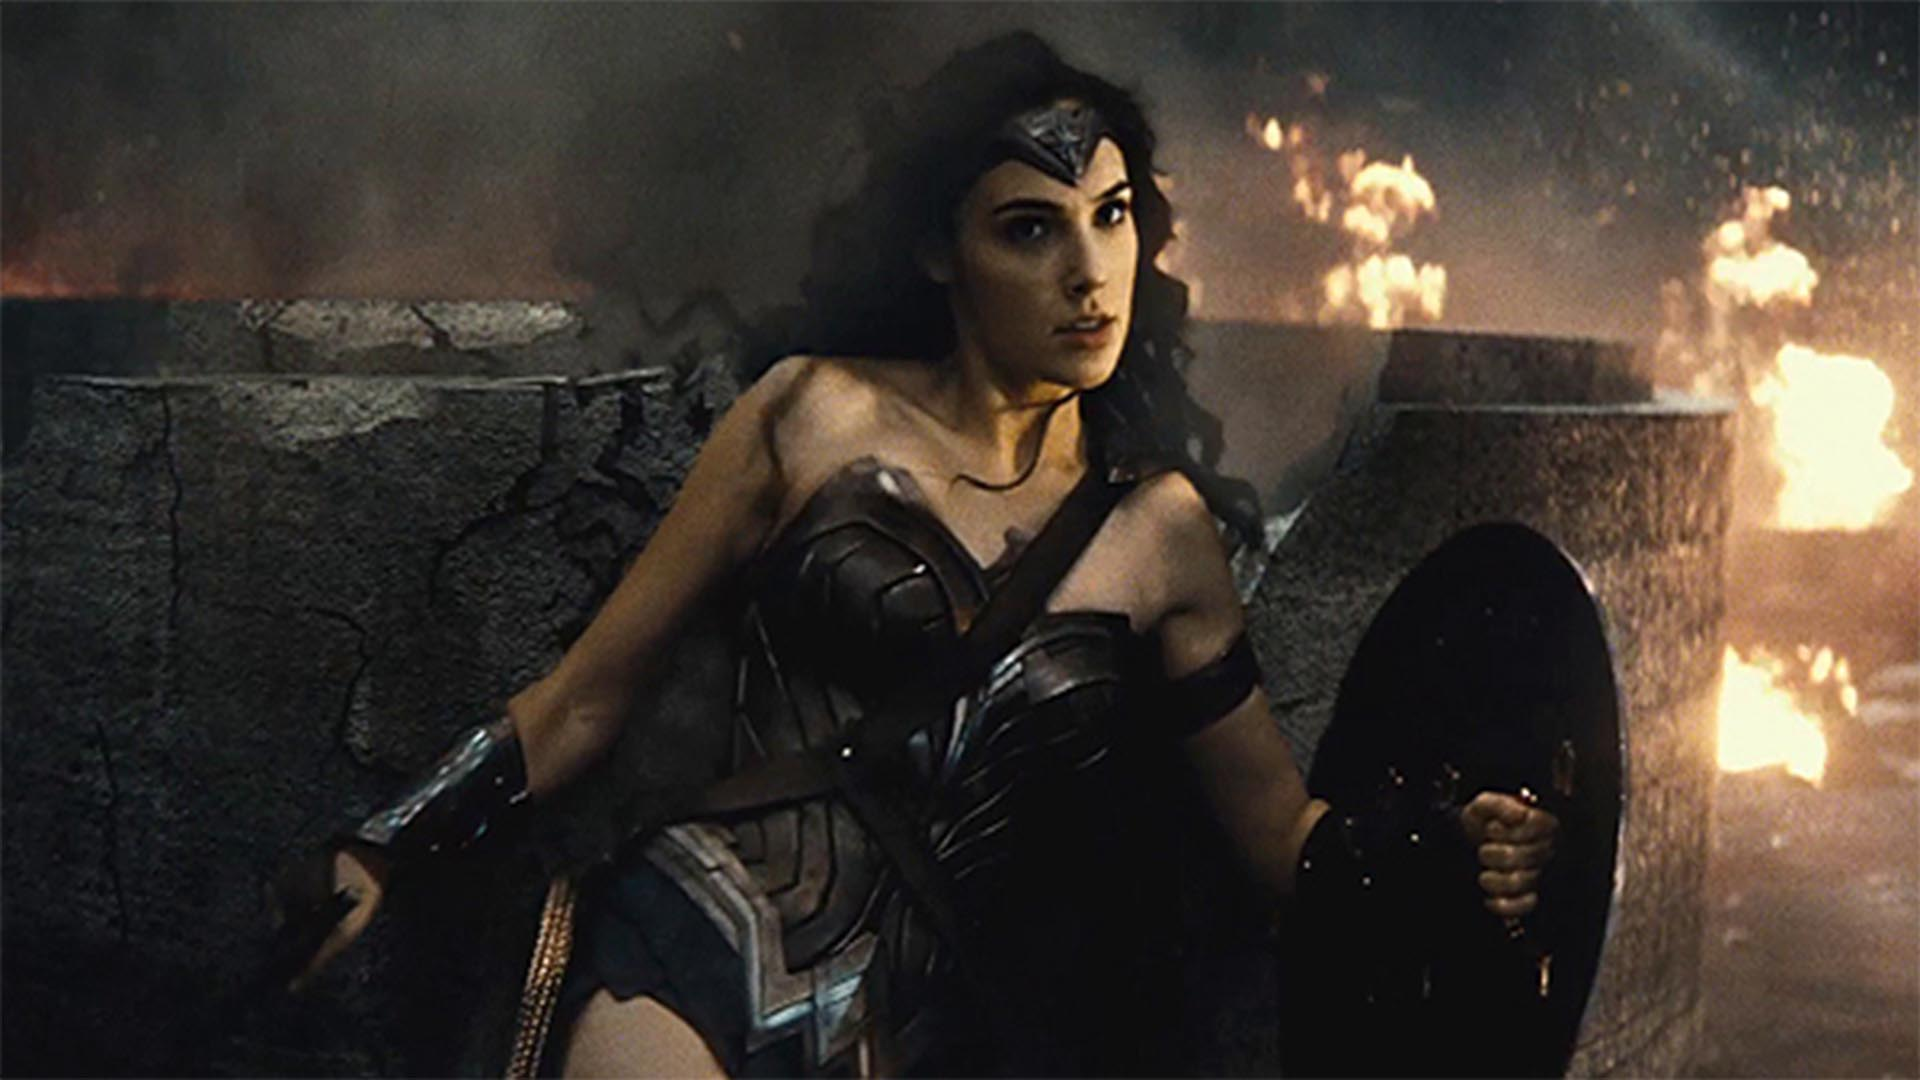 Hd wallpaper wonder woman - Wonder Woman Film 2017 Hd Wallpapers Free Download